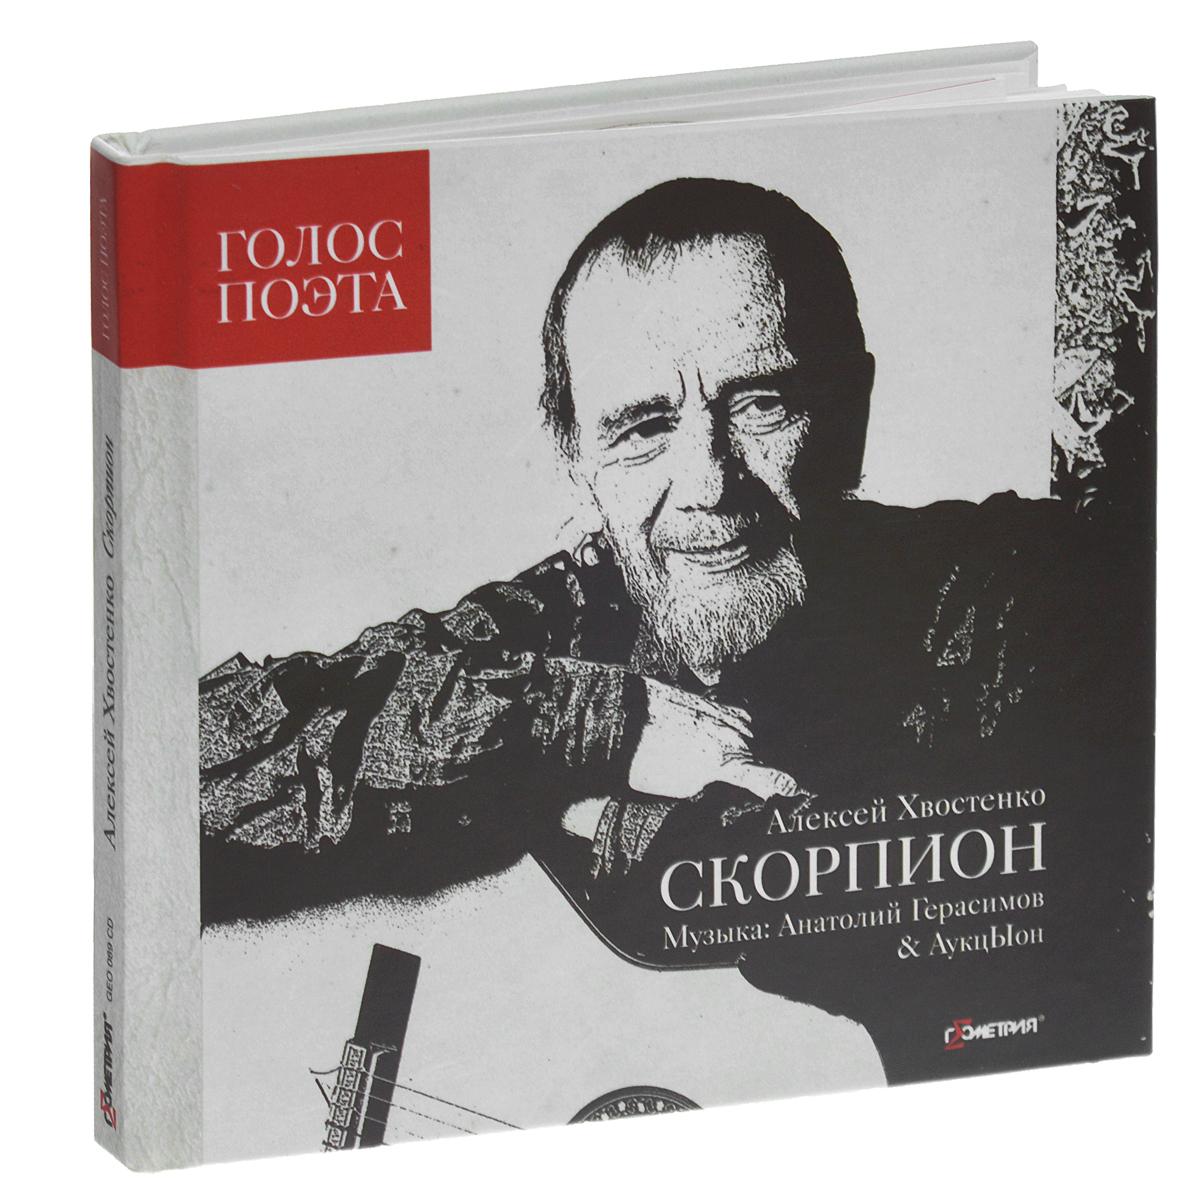 Хвост, Герасимов & АукцЫон. Скорпион